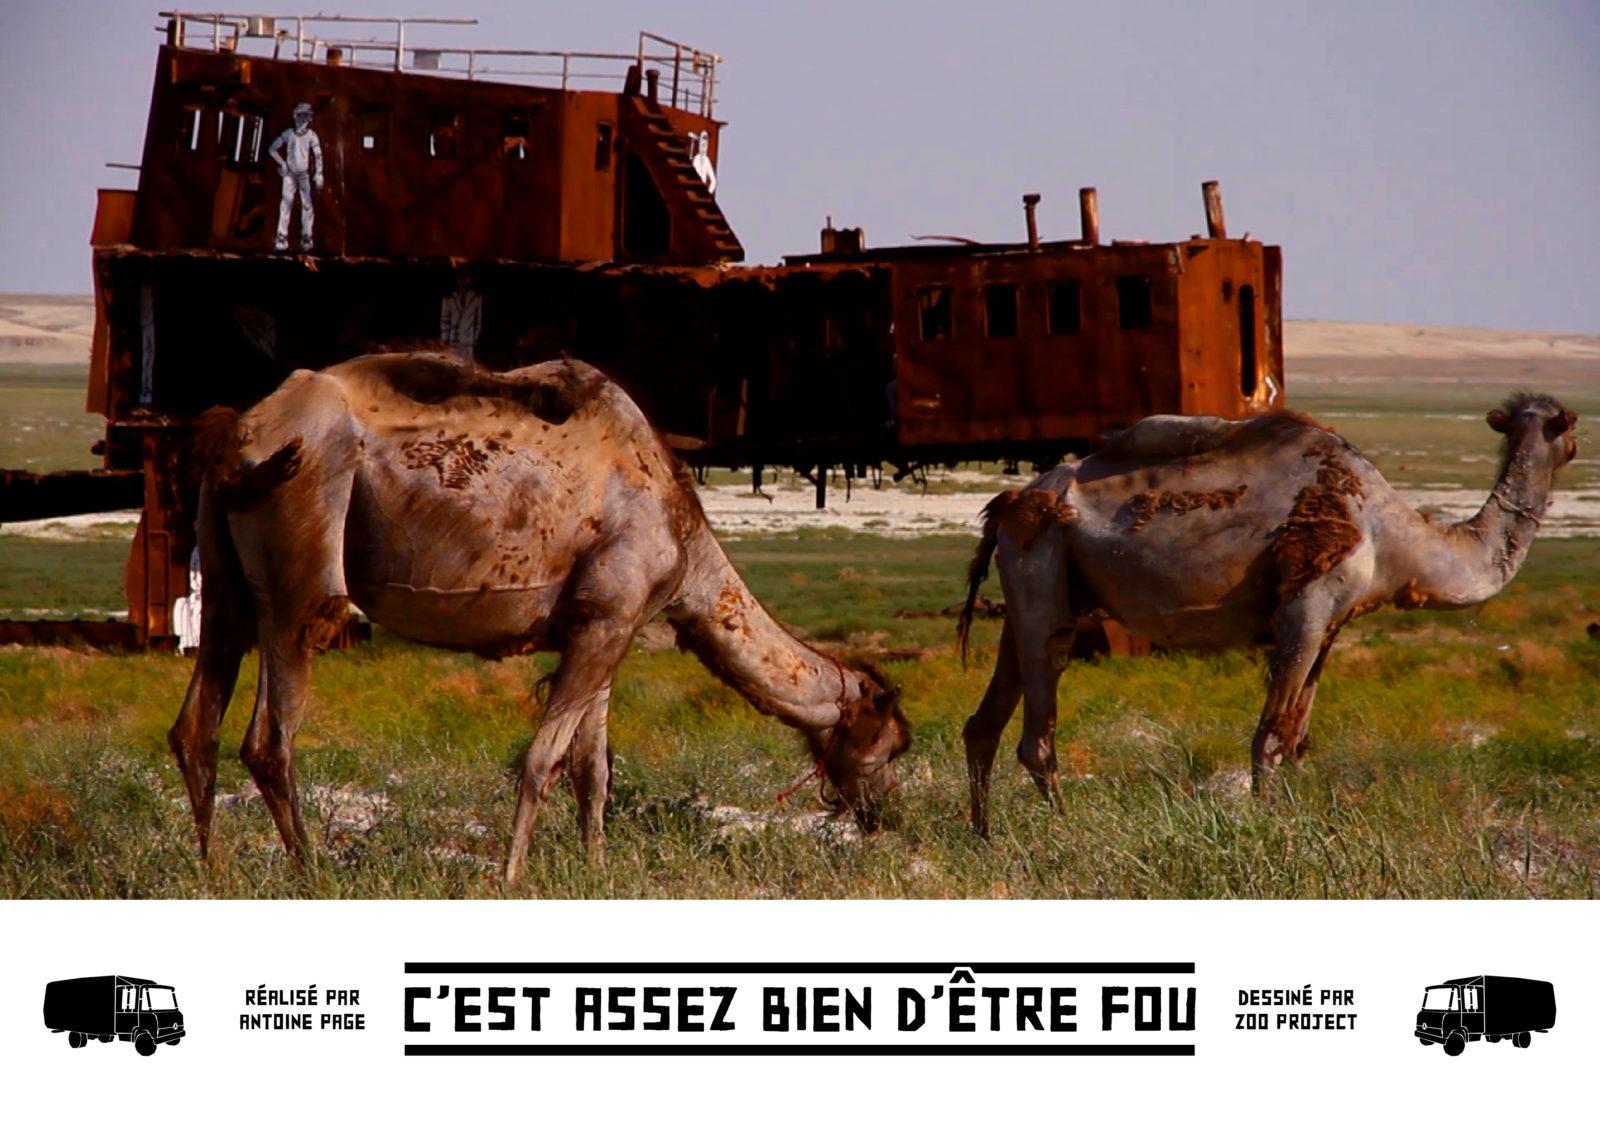 hommage documentaire zoo project - Le documentaire-hommage au street artiste Zoo Project enfin au cinéma